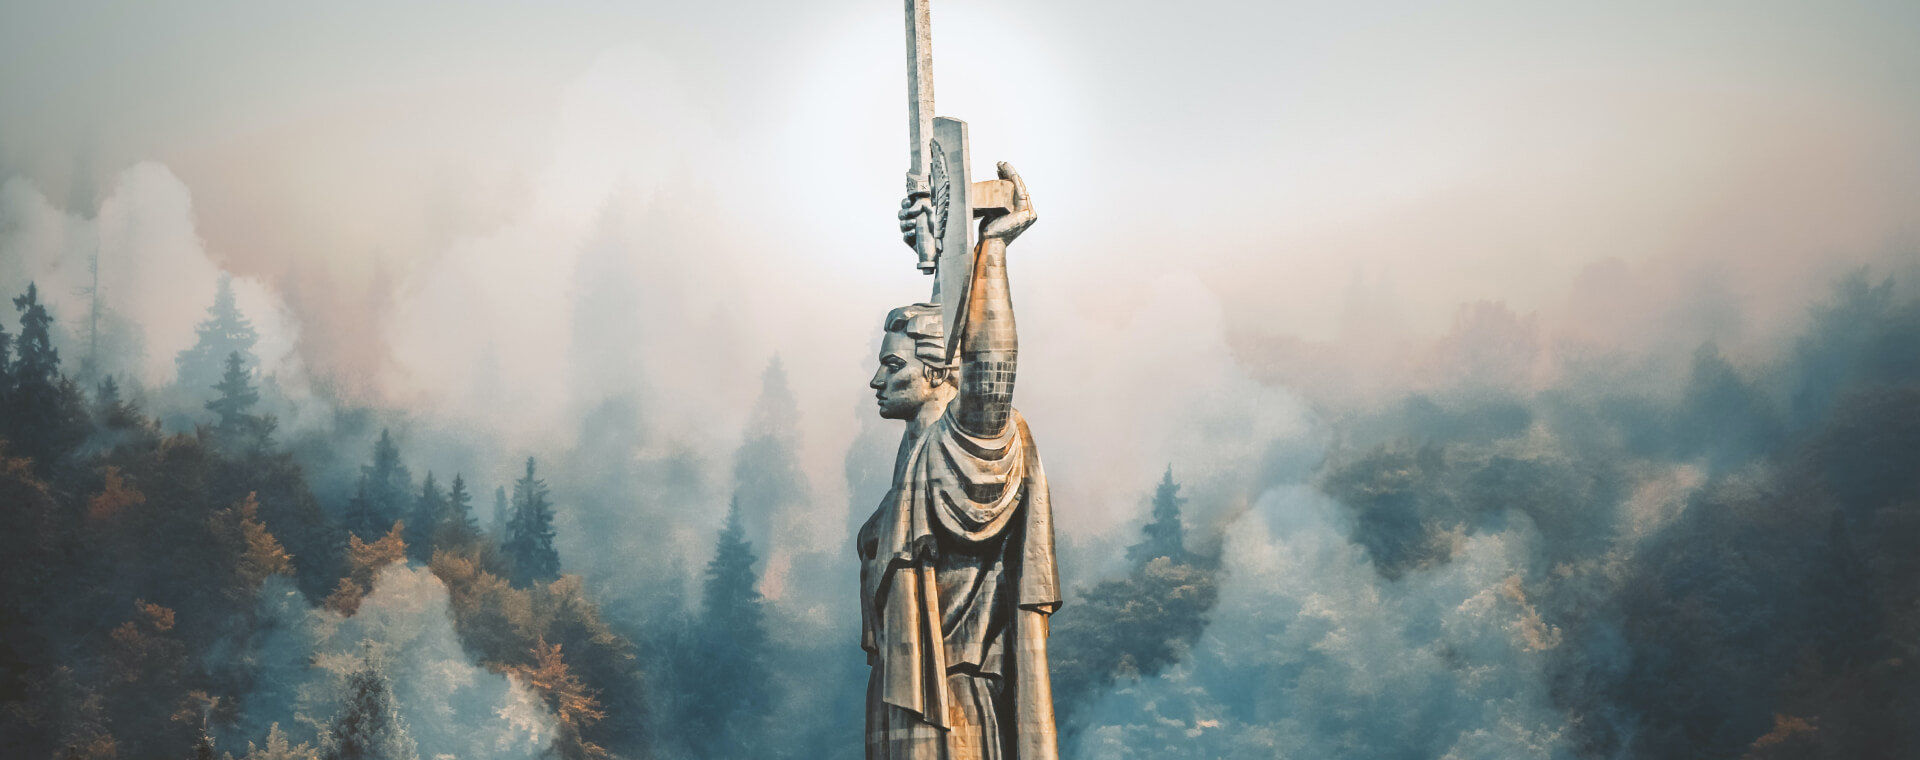 Ukraine risks illustration